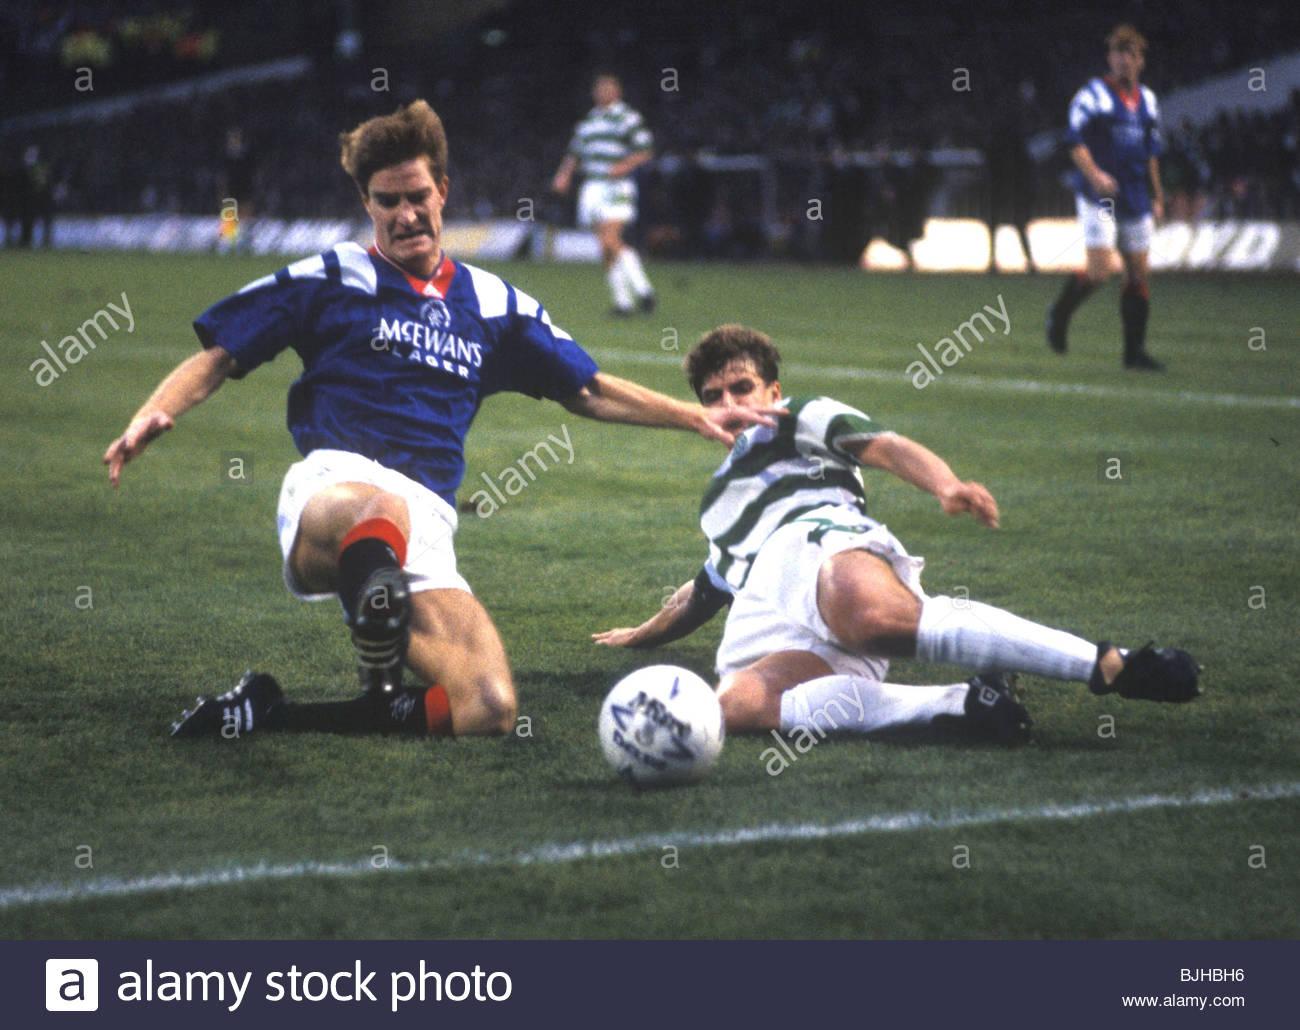 08/11/92 PREMIER DIVISION CELTIC V RANGERS (0-1) CELTIC PARK - GLASGOW Rangers defender Richard Gough (left) goes - Stock Image